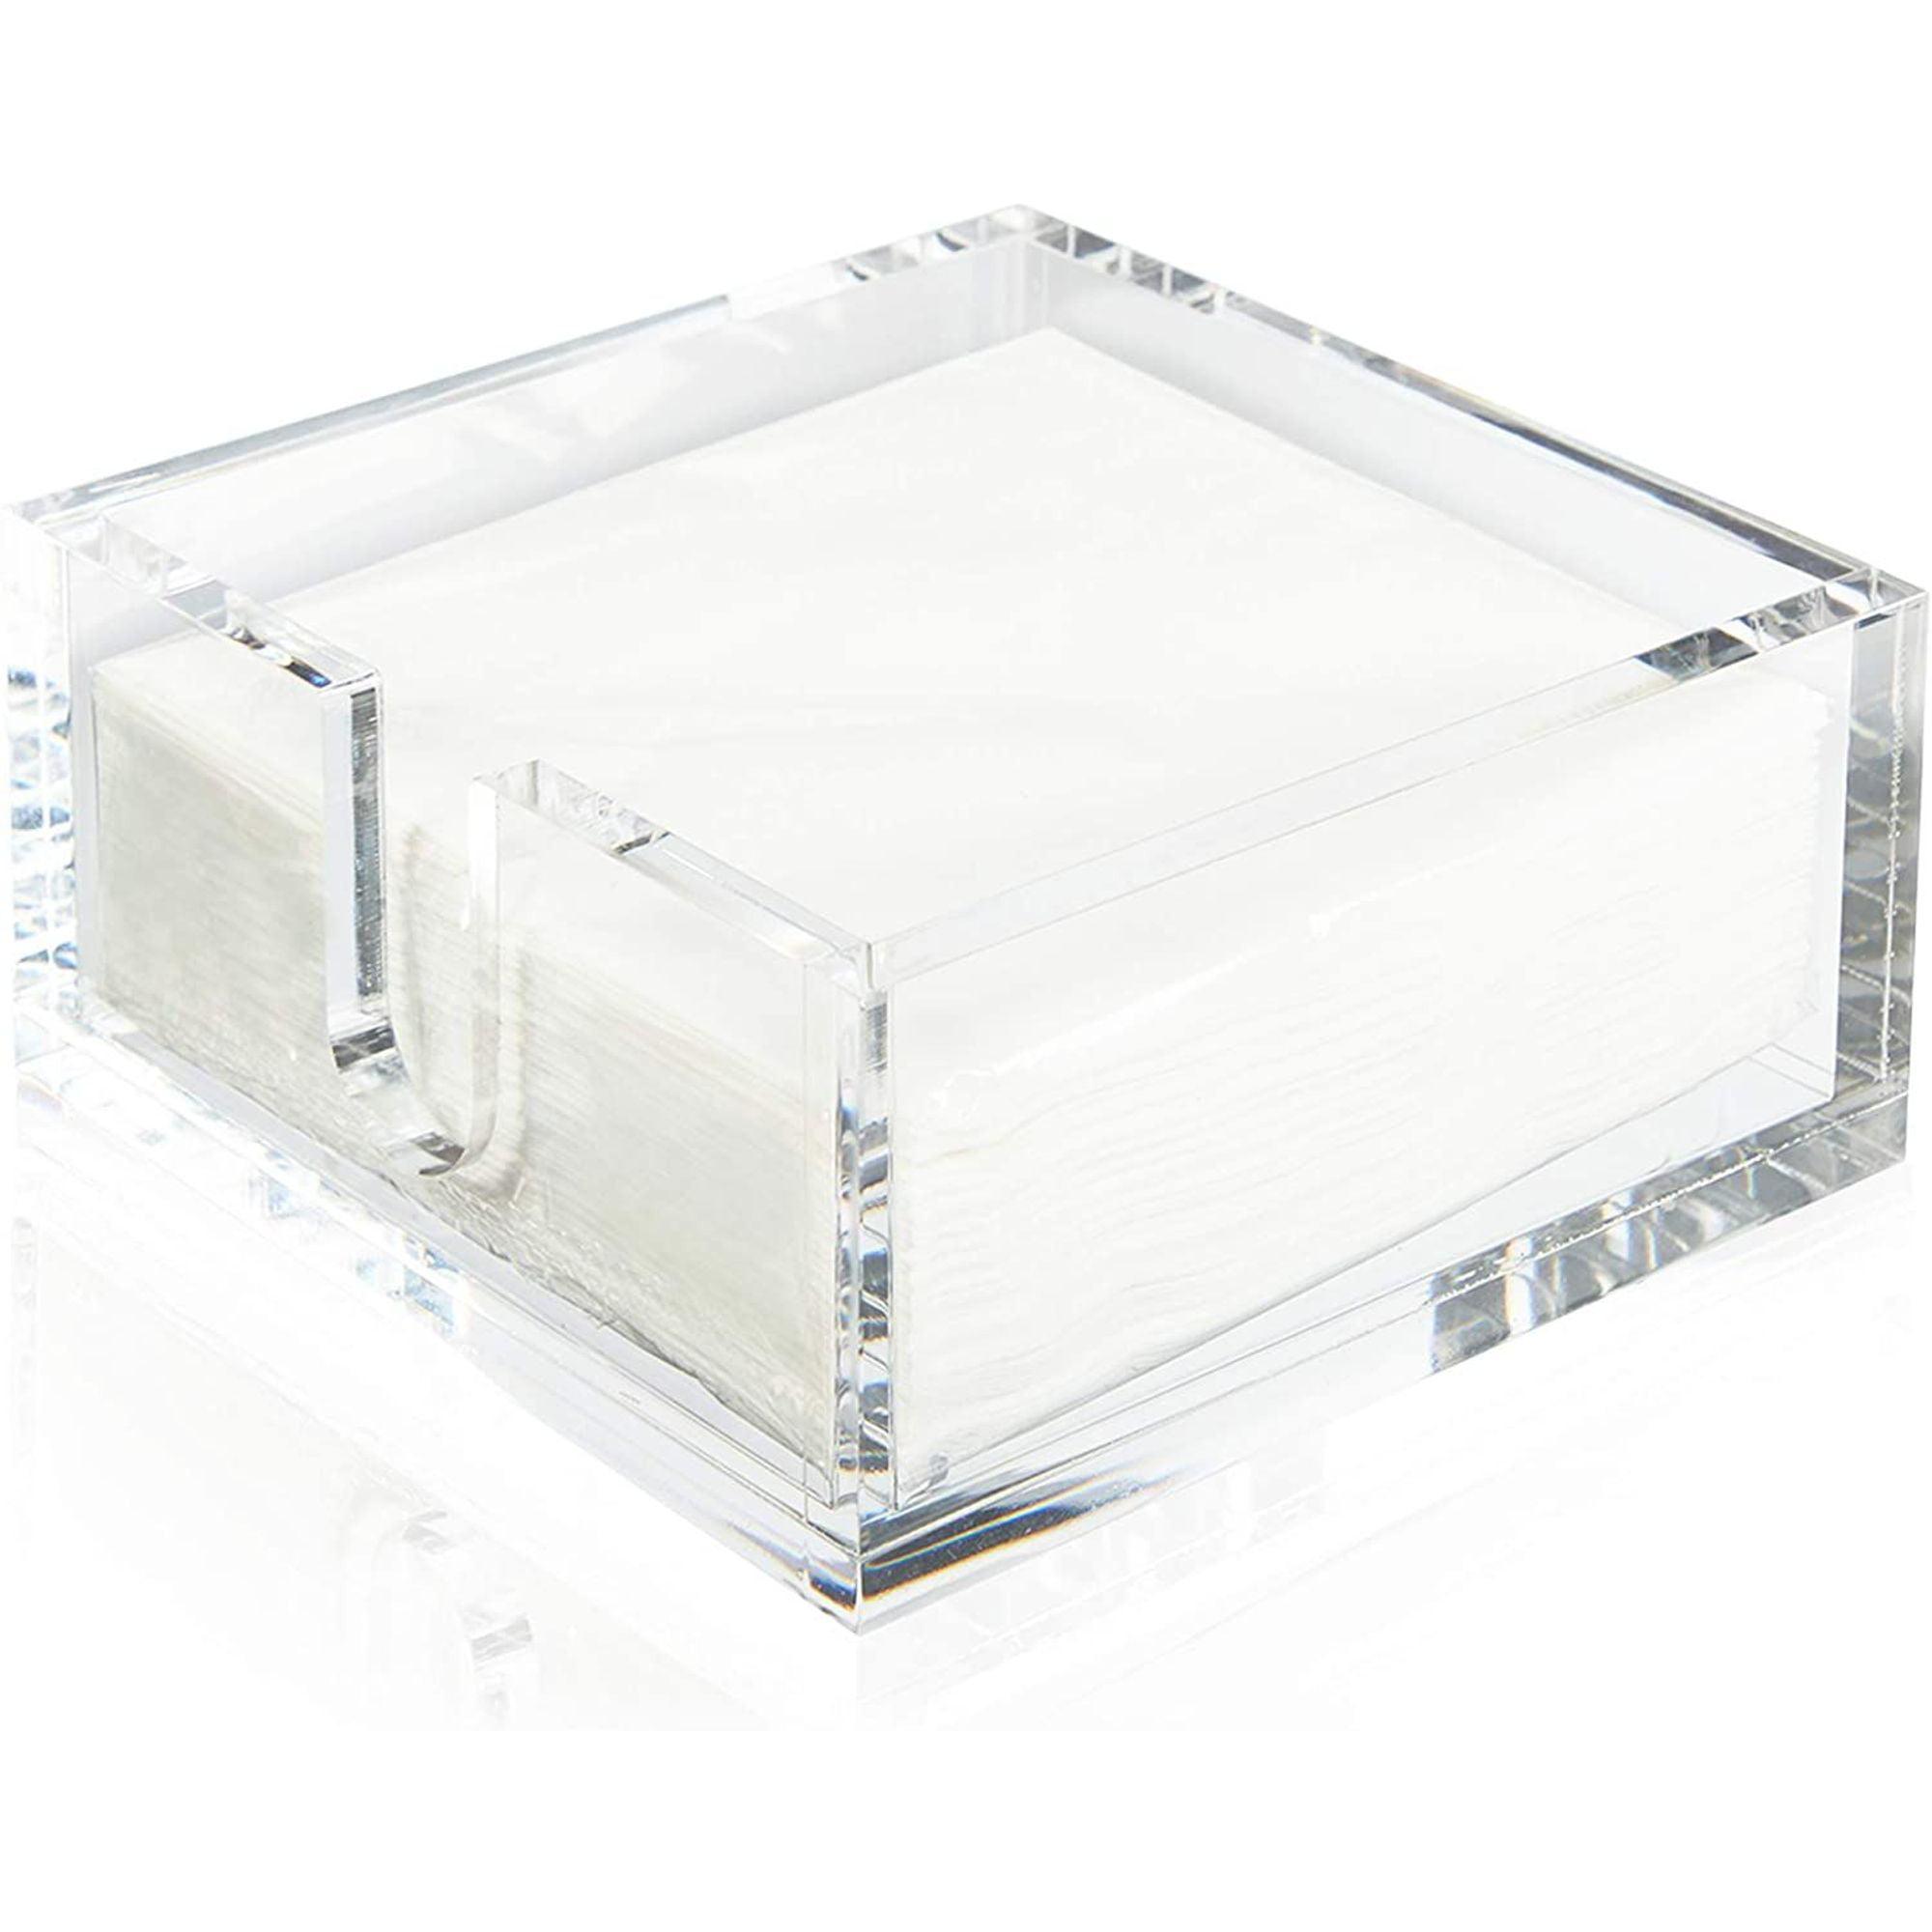 Clear Acrylic Flat Napkin Holder For Kitchen With 50 White Napkin Set 5 8 X5 8 X2 6 Walmart Com Walmart Com